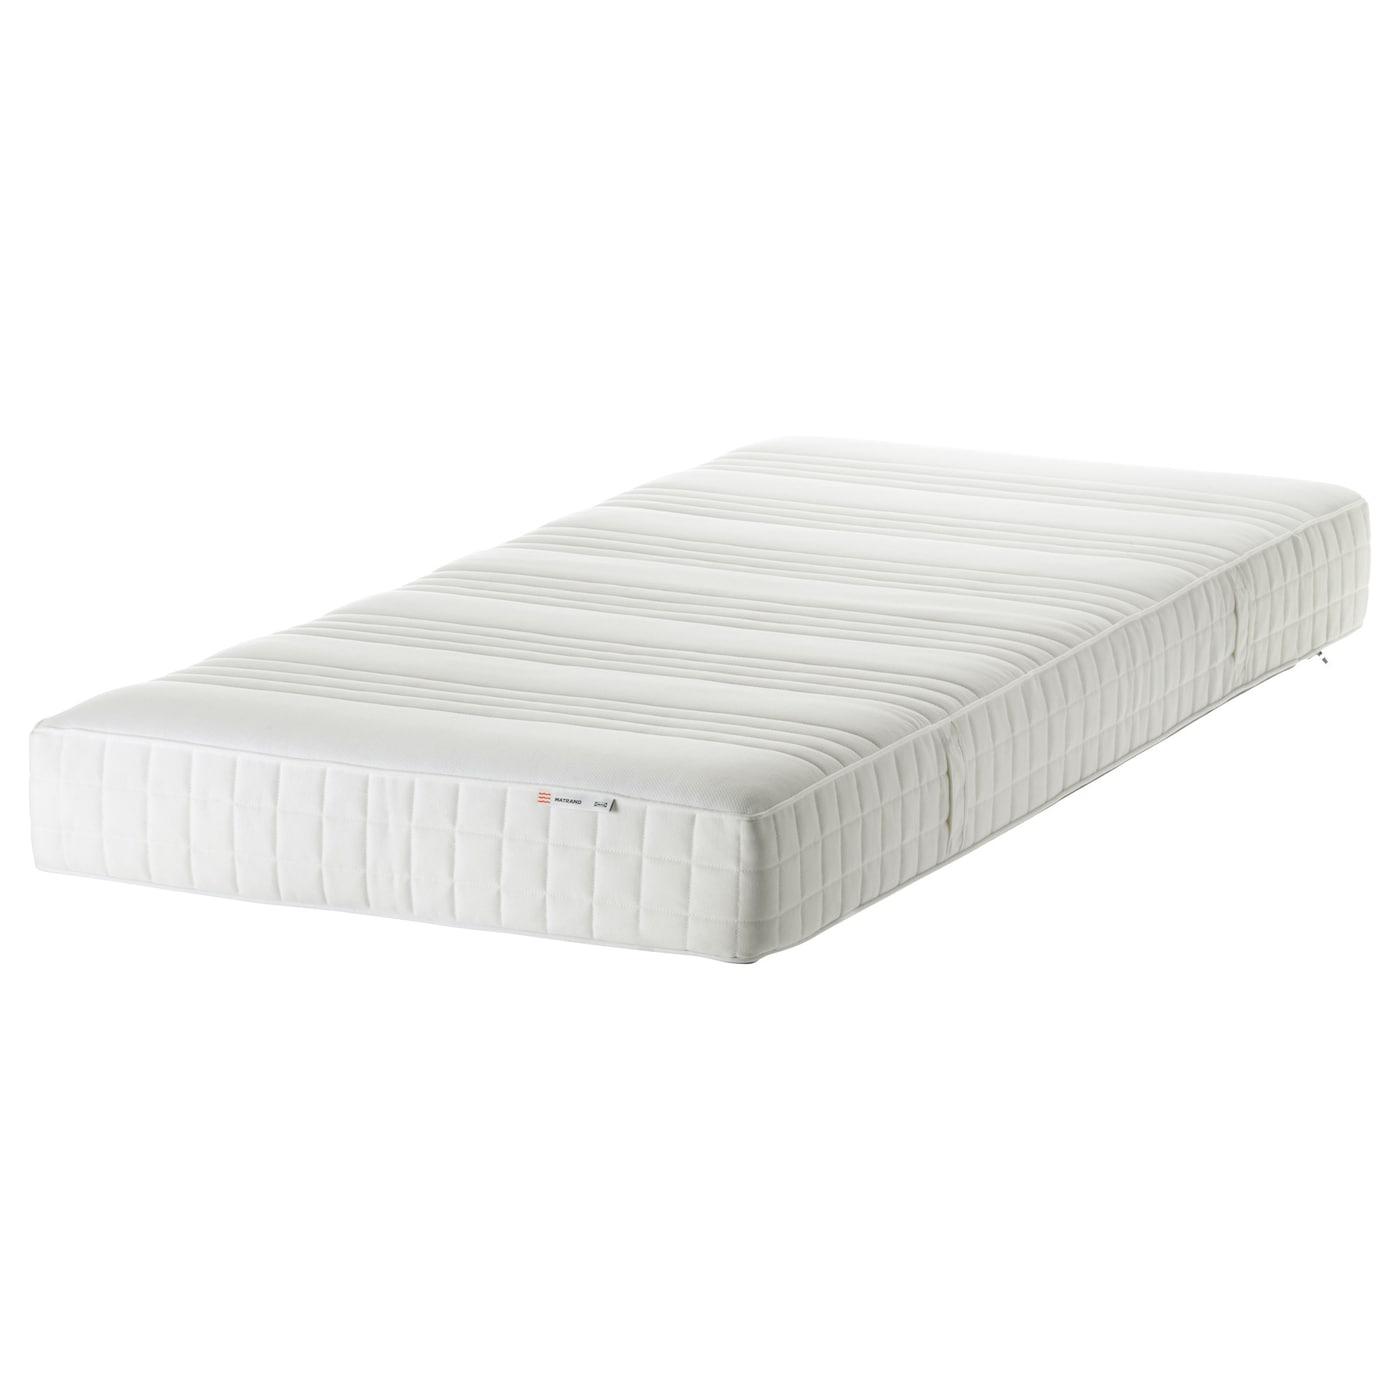 goedkope matrassen 90x200 140x200 160x200 180x200 ikea. Black Bedroom Furniture Sets. Home Design Ideas